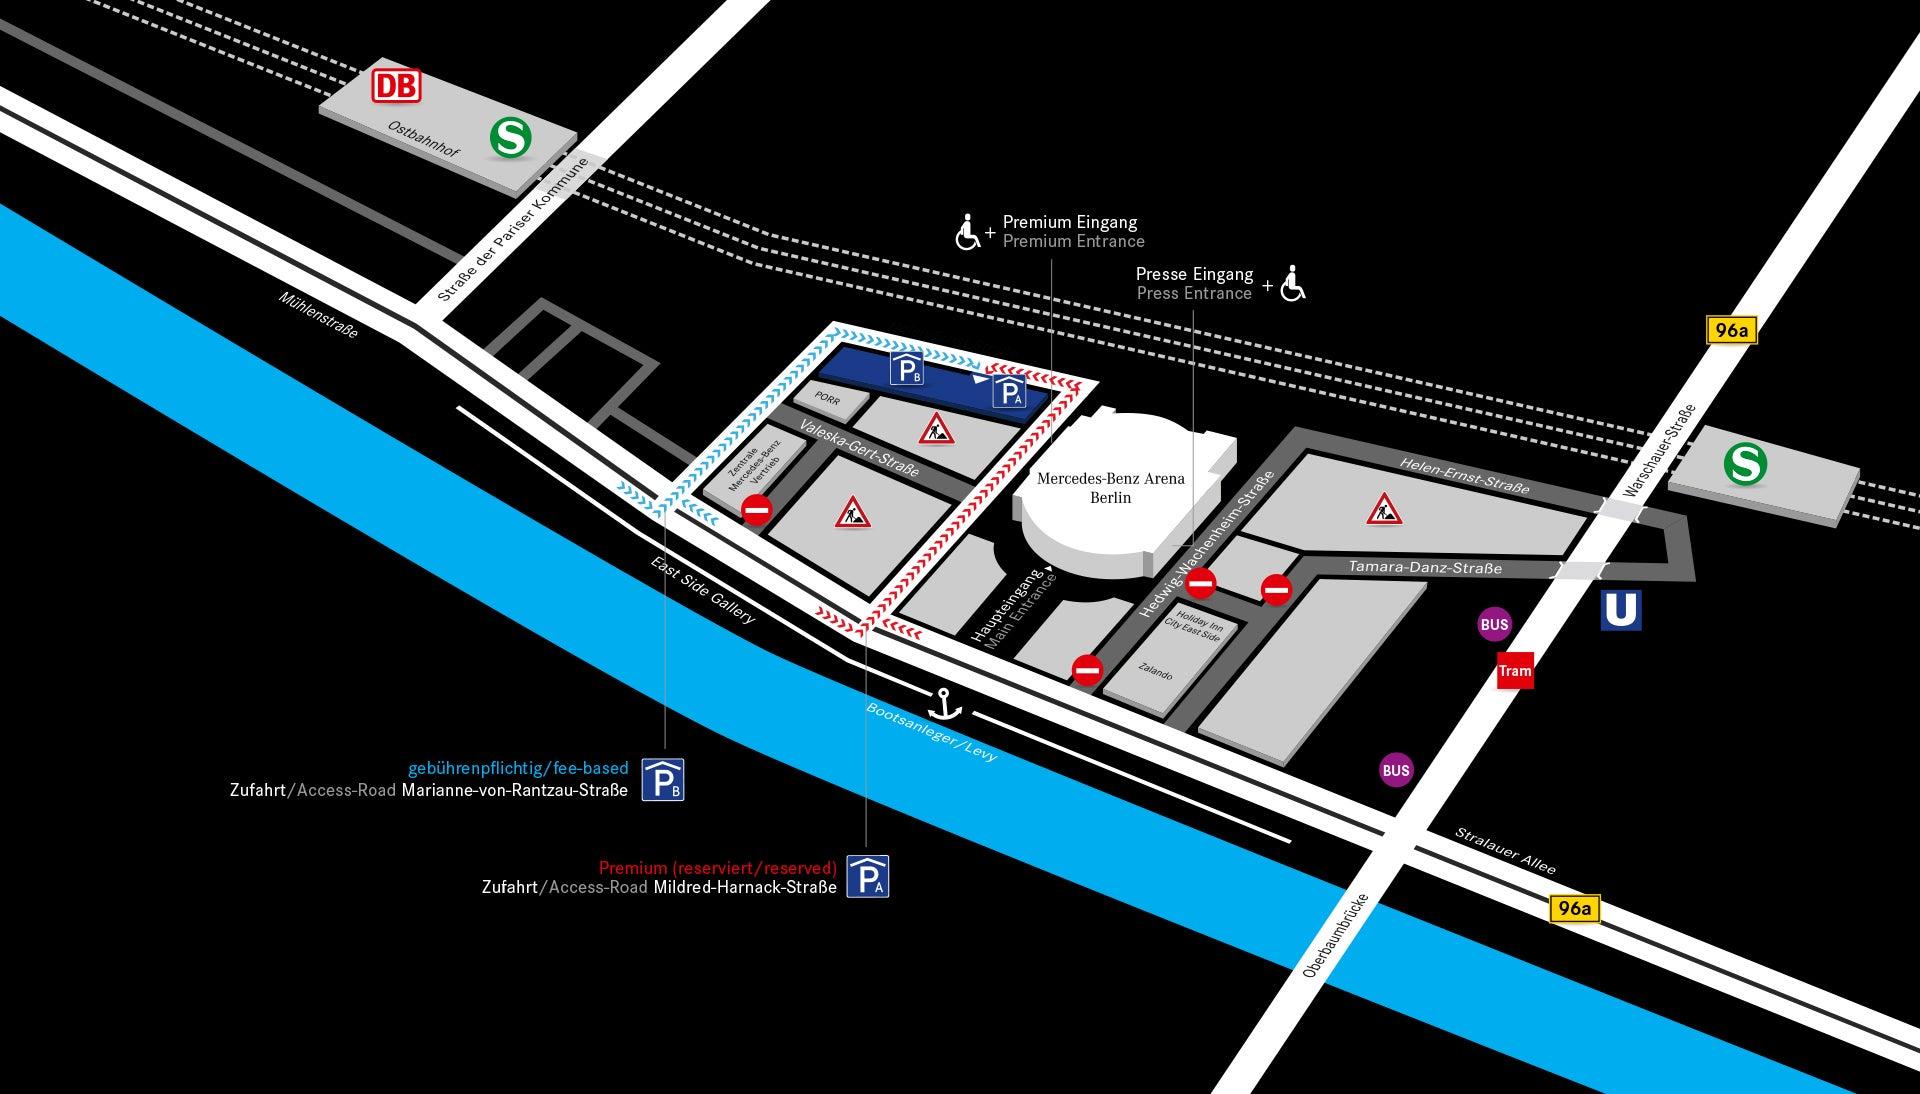 160304_MBA_Map_06_03-f376f70658.jpg